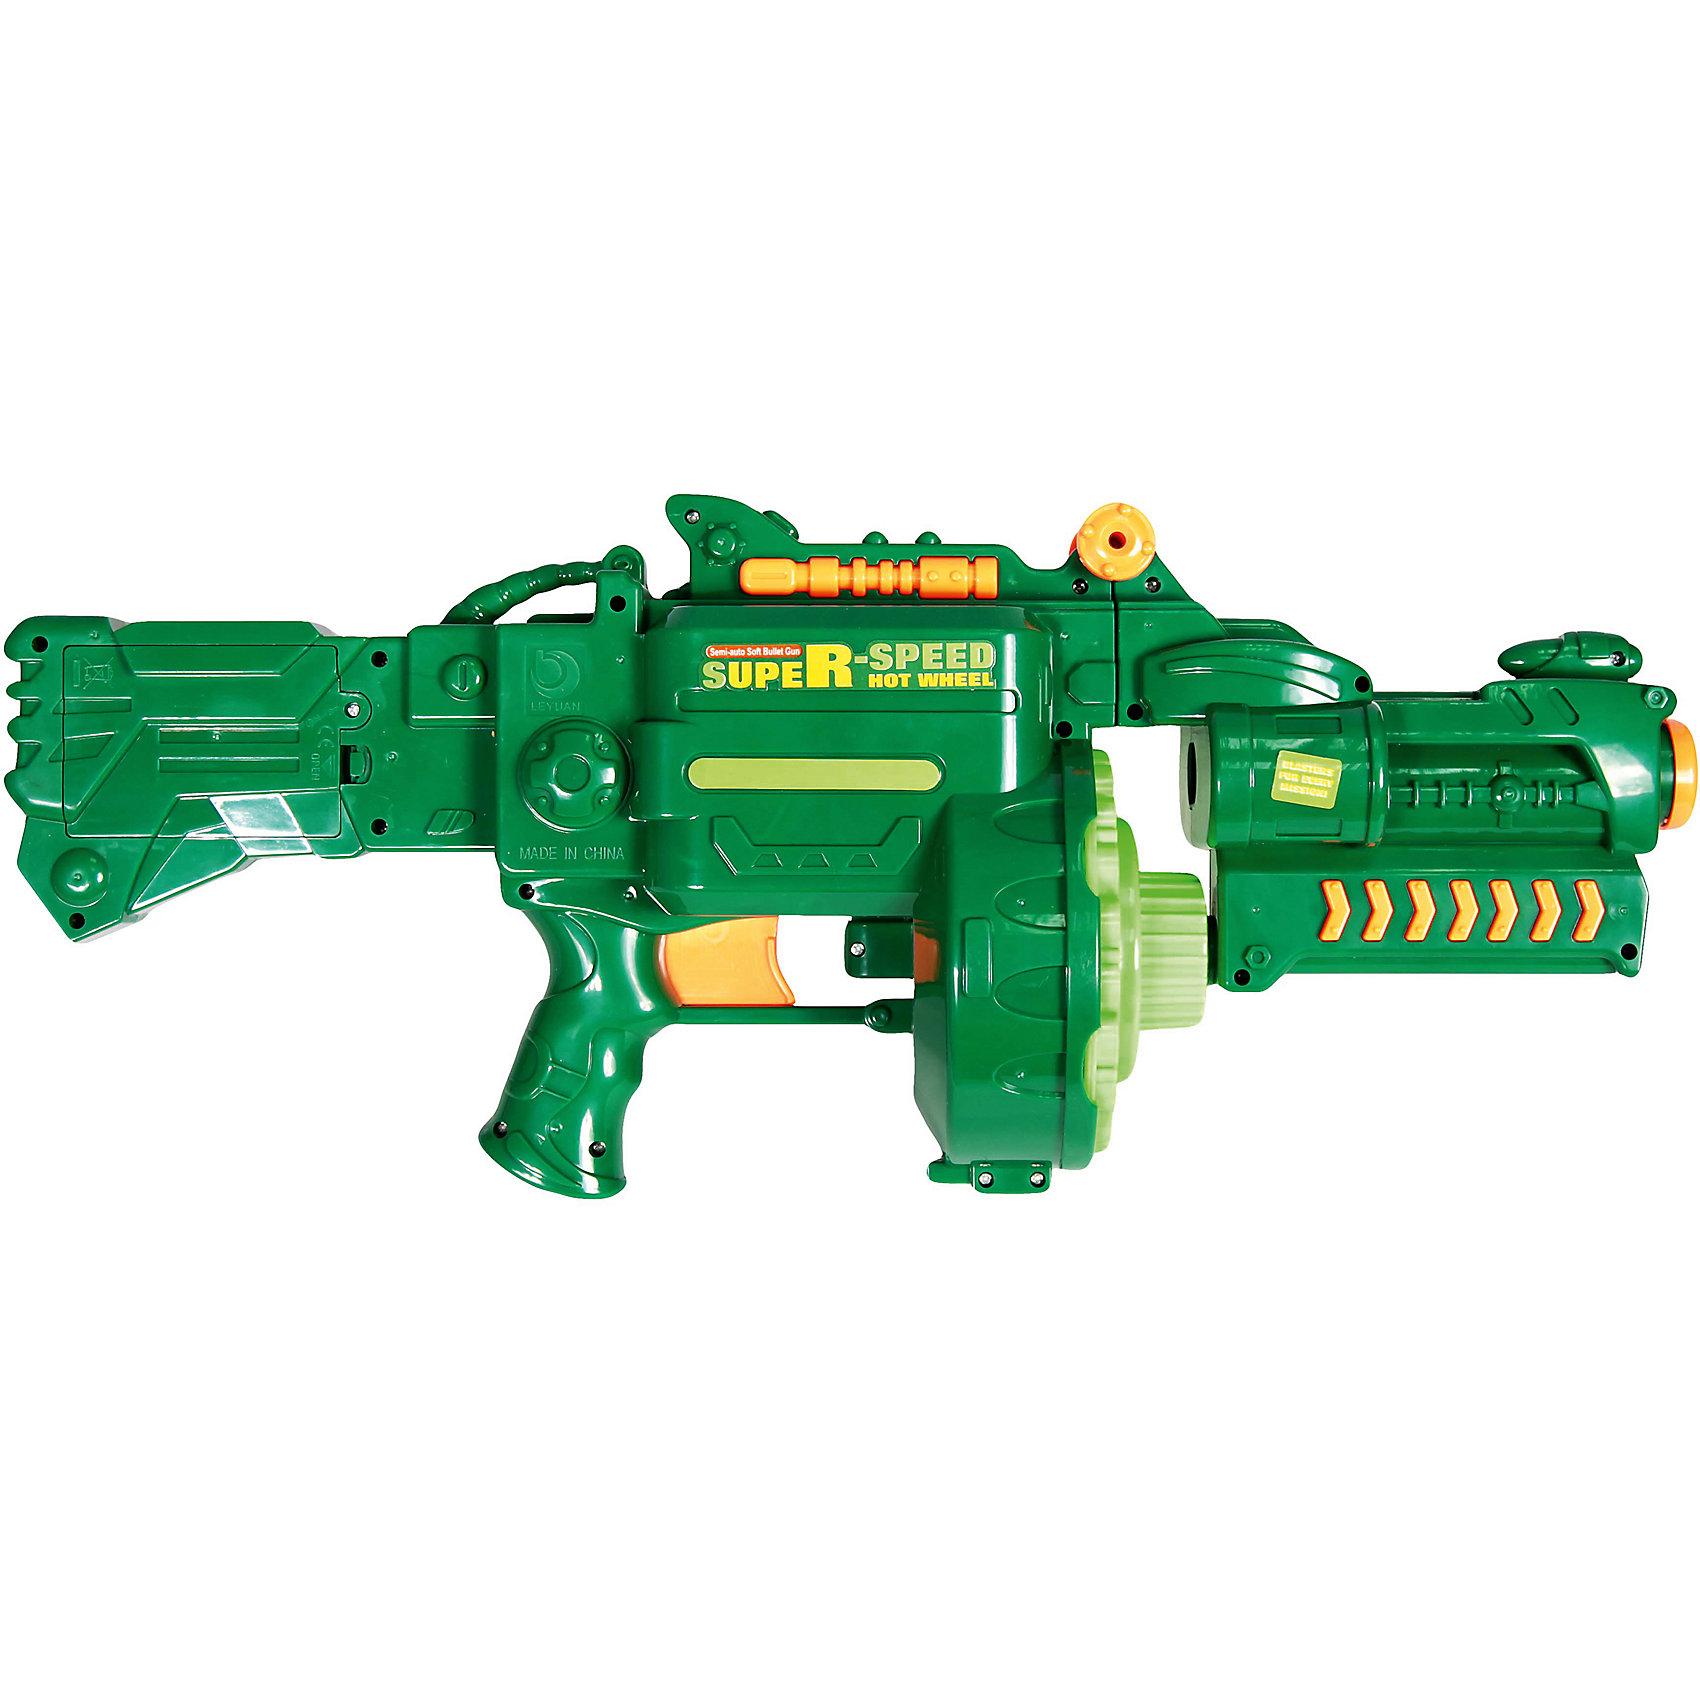 Автомат с пулями на присосках, Mioshi  Army